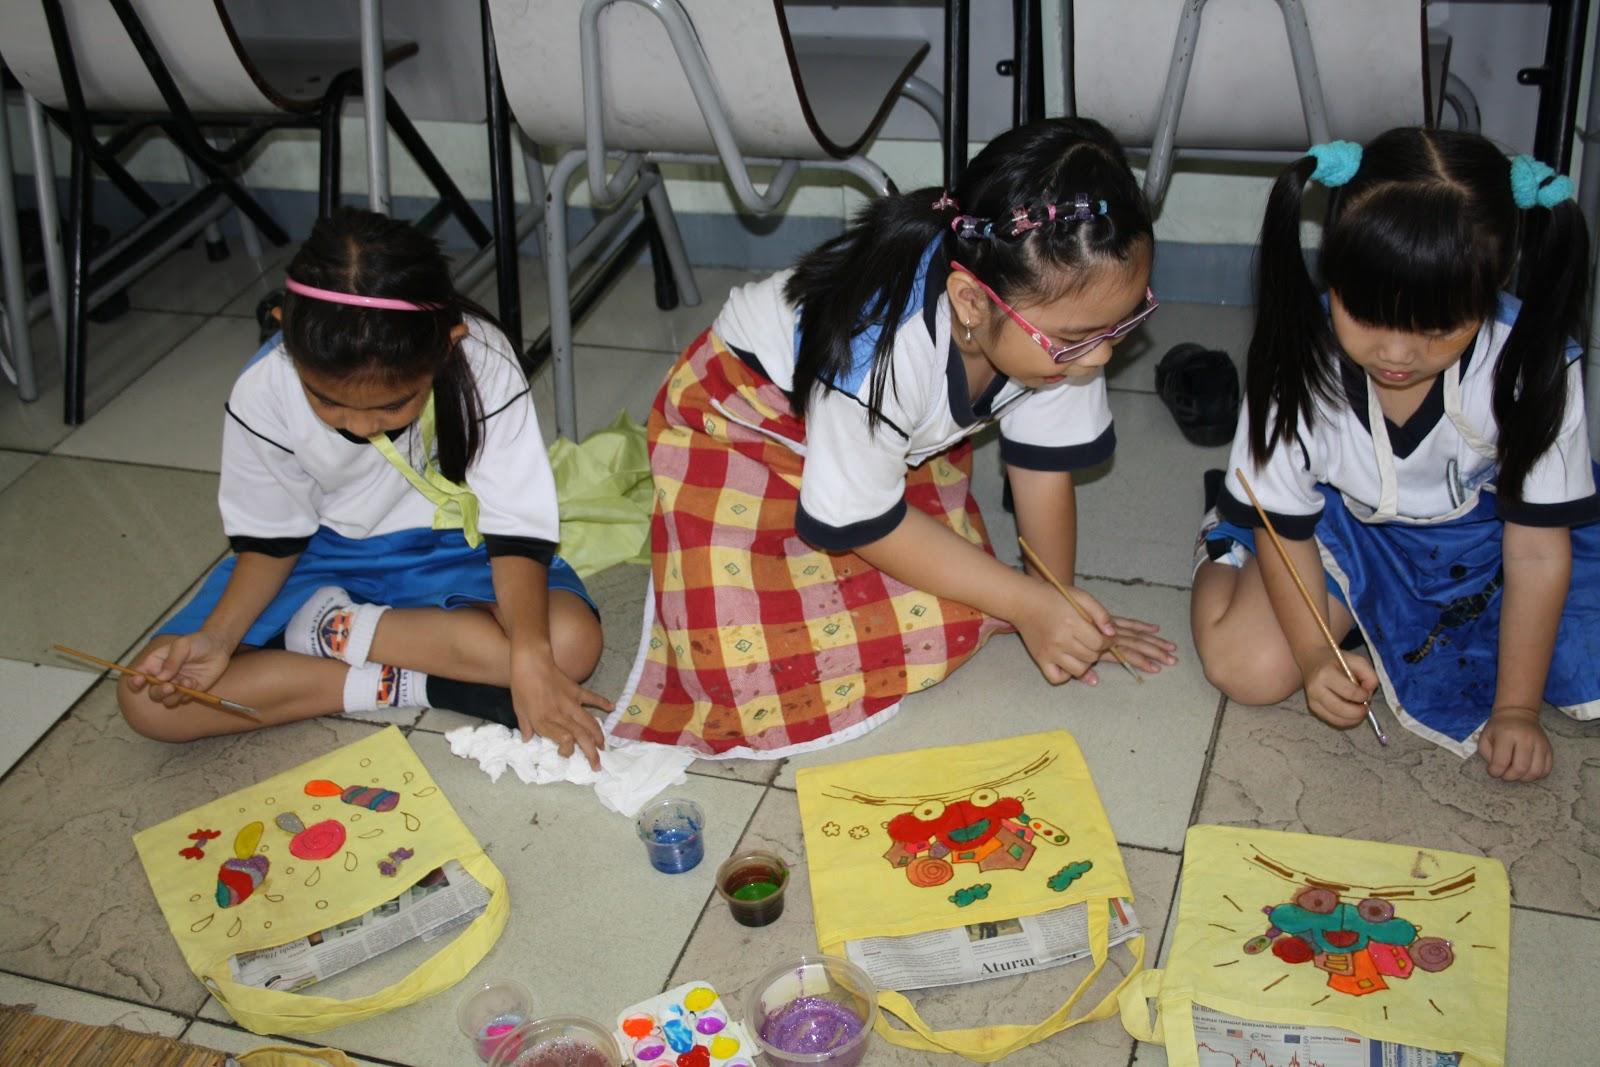 Ada terdapat banyak pilihan warna yang digunakan untuk mewarnai tas sesuai selera siswa siswi Dalam proses pewarnaan haruslah hati hati agar cat yang